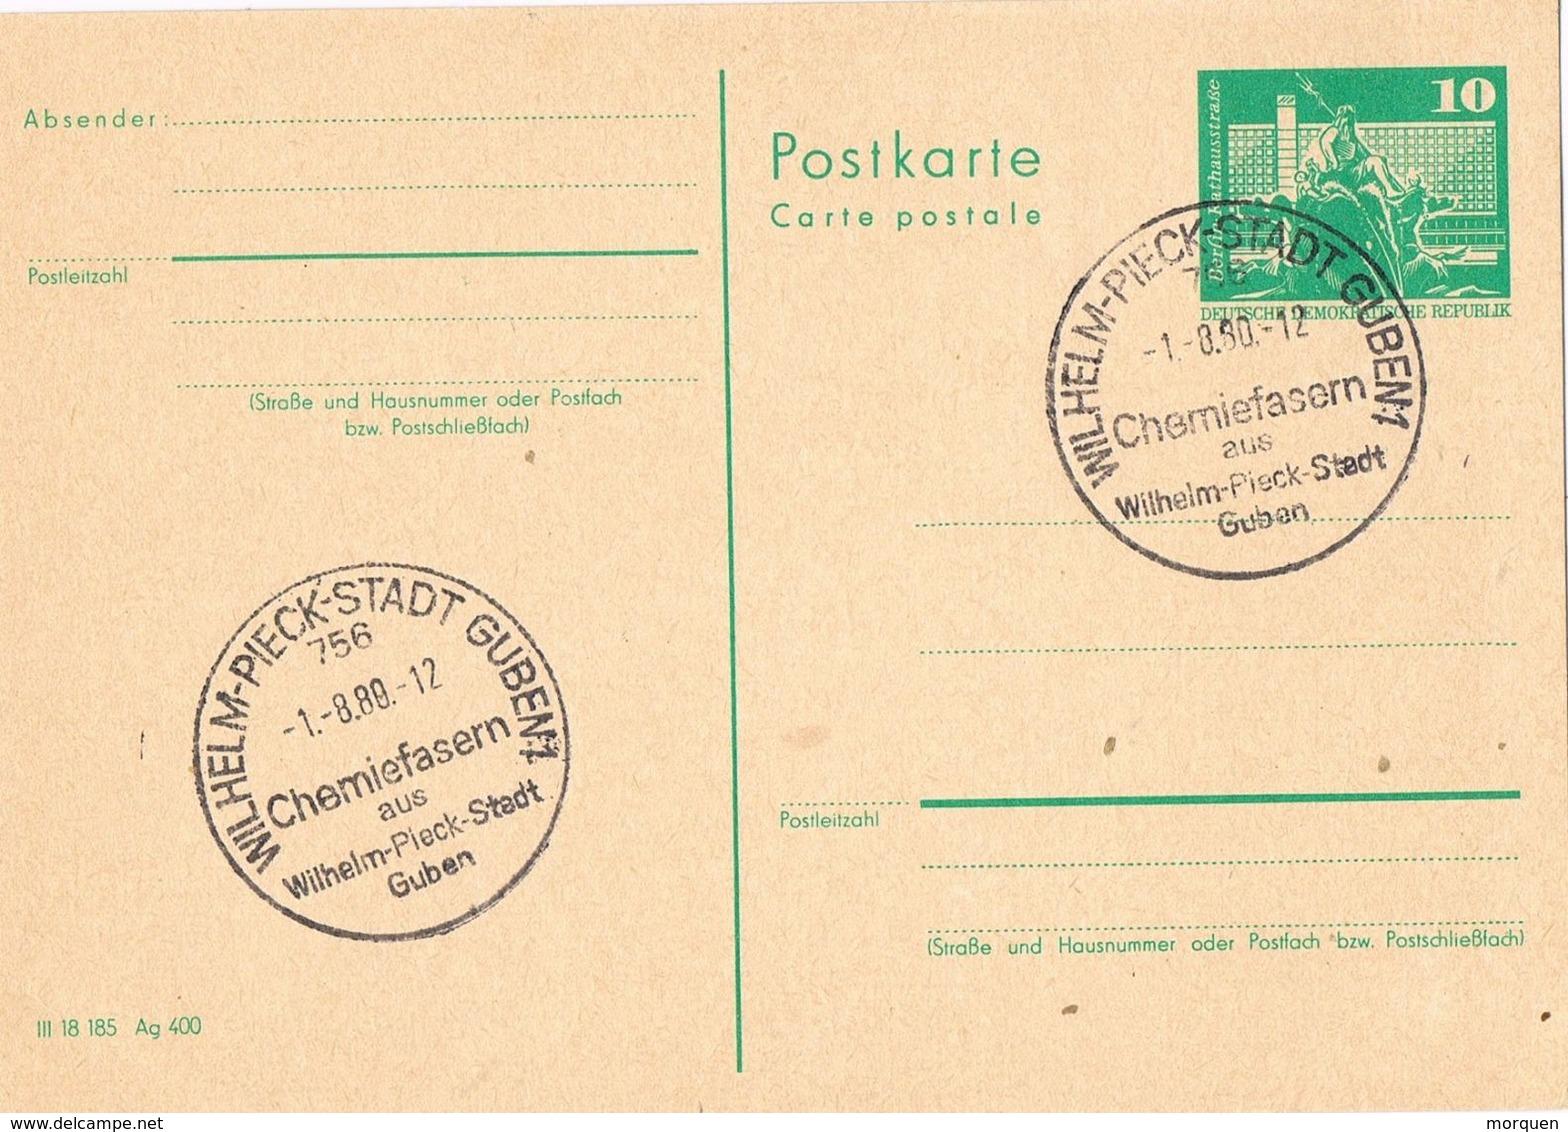 29550. Entero Postal WILHELM PIECK Stadt (Alemania DDR) 1980. Fibras Quimicas - Postales - Usados